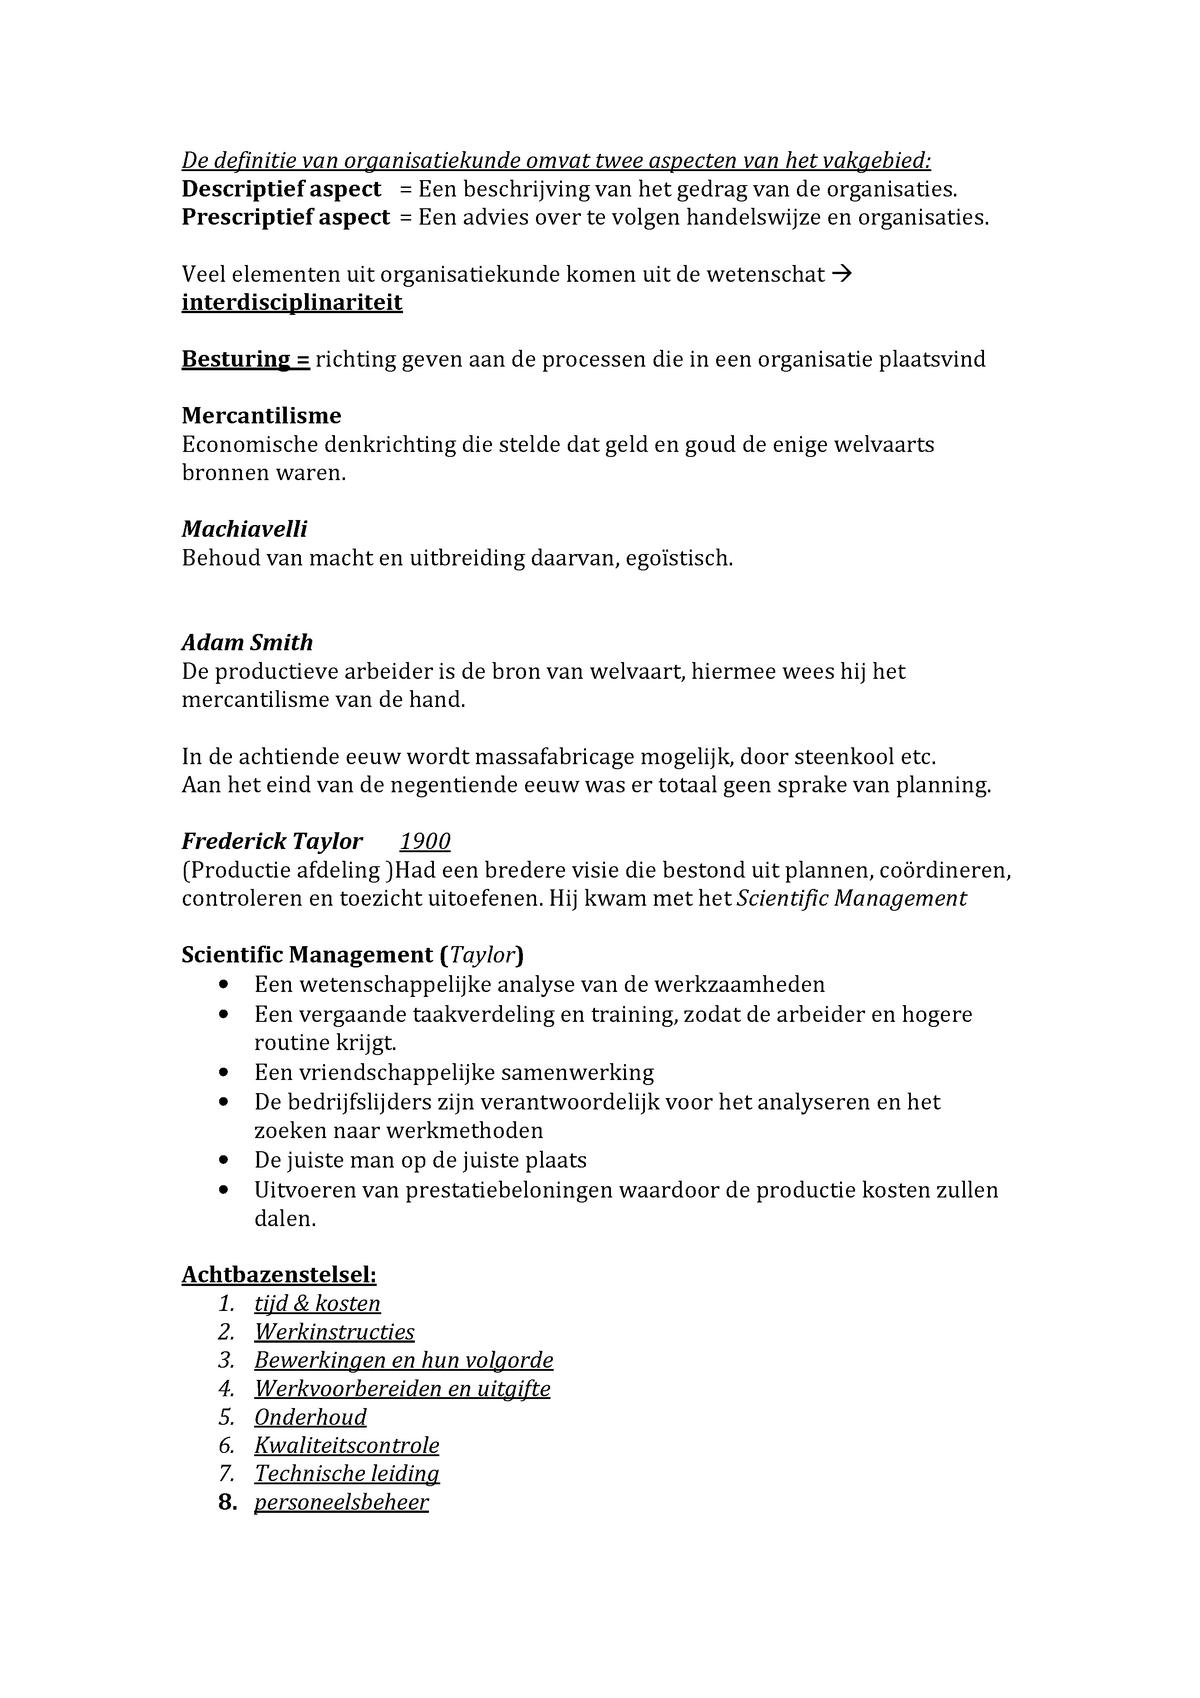 4a62967d9e0 Samenvatting grondslagen - Bedrijfskunde 1000BDK_13 - StudeerSnel.nl